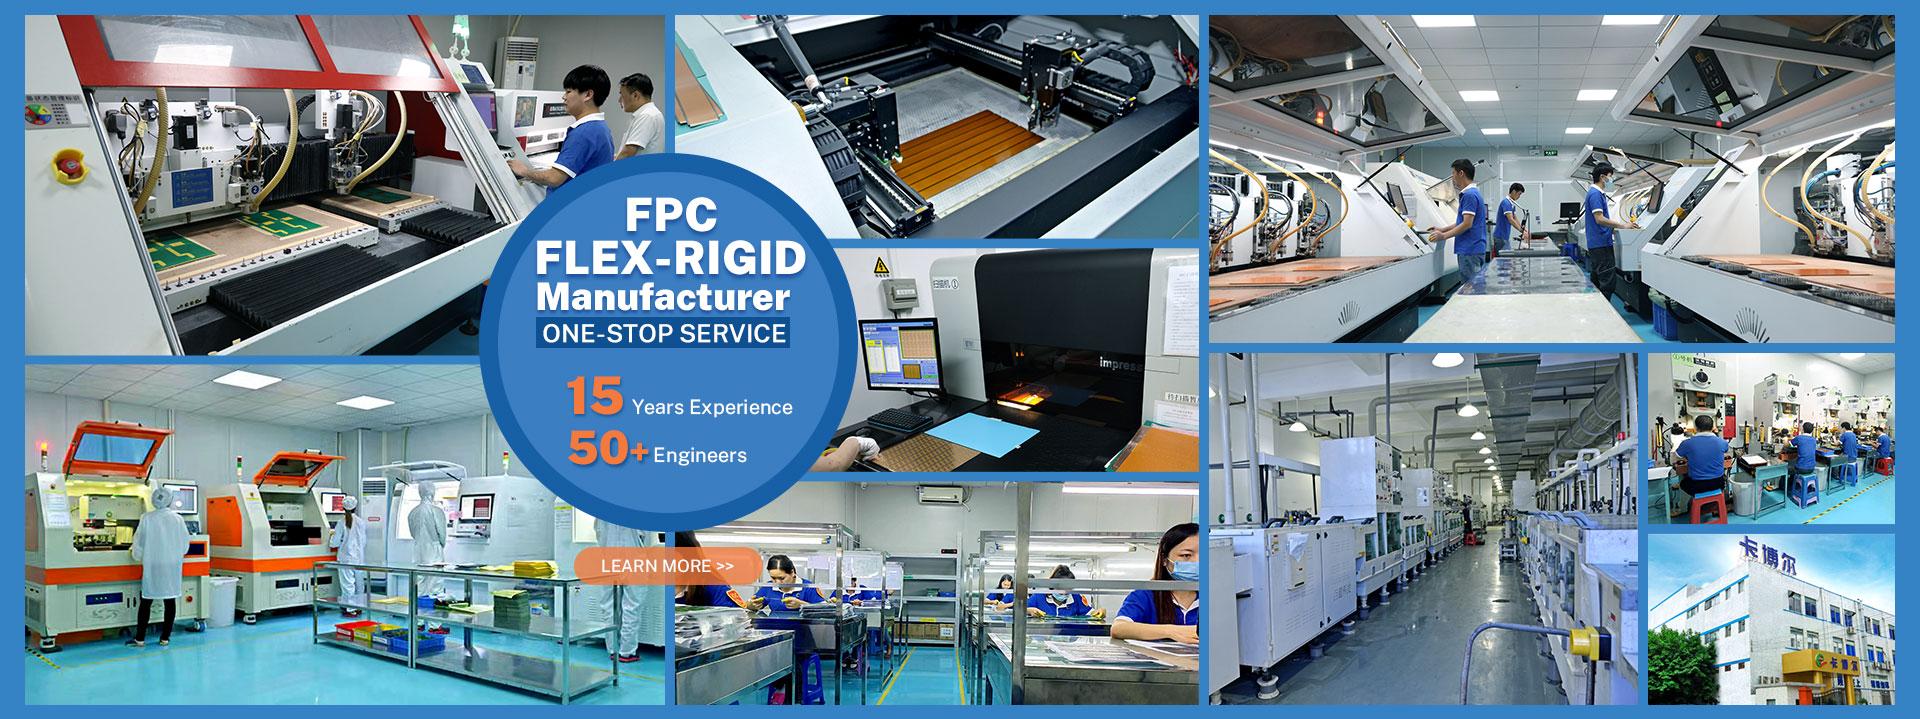 Flexible Circuit Board Fpc Pcb Mcpcb Pcba Shenzhen Capel Learn About Boards 3 2 1